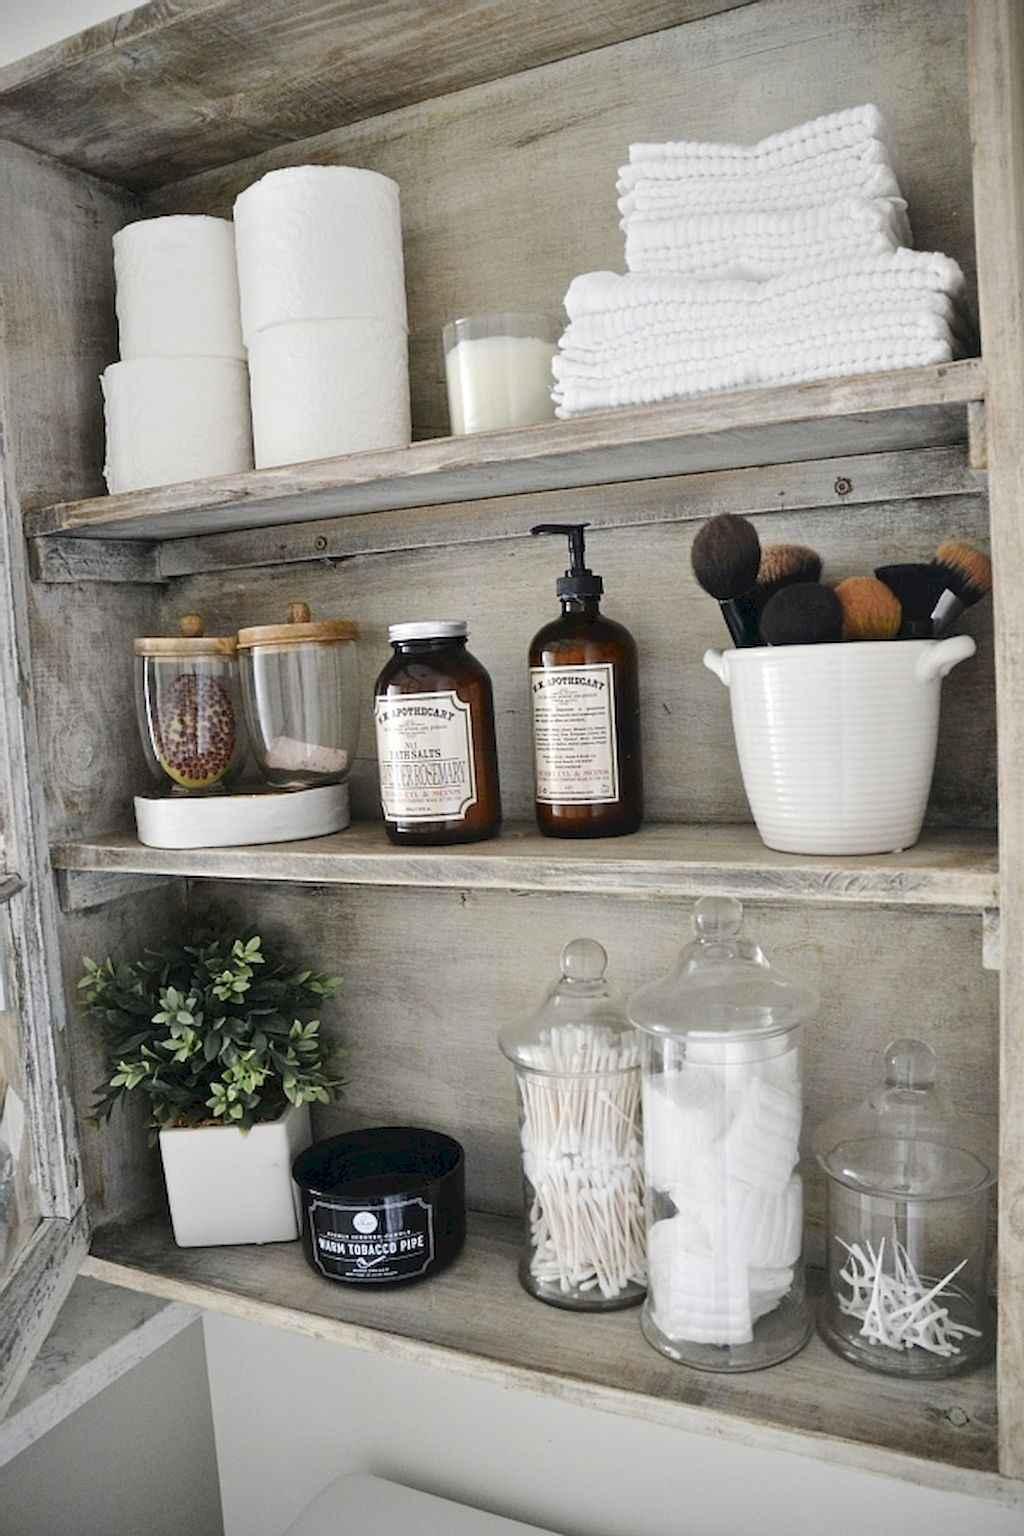 Cool bathroom storage shelves organization ideas (22)